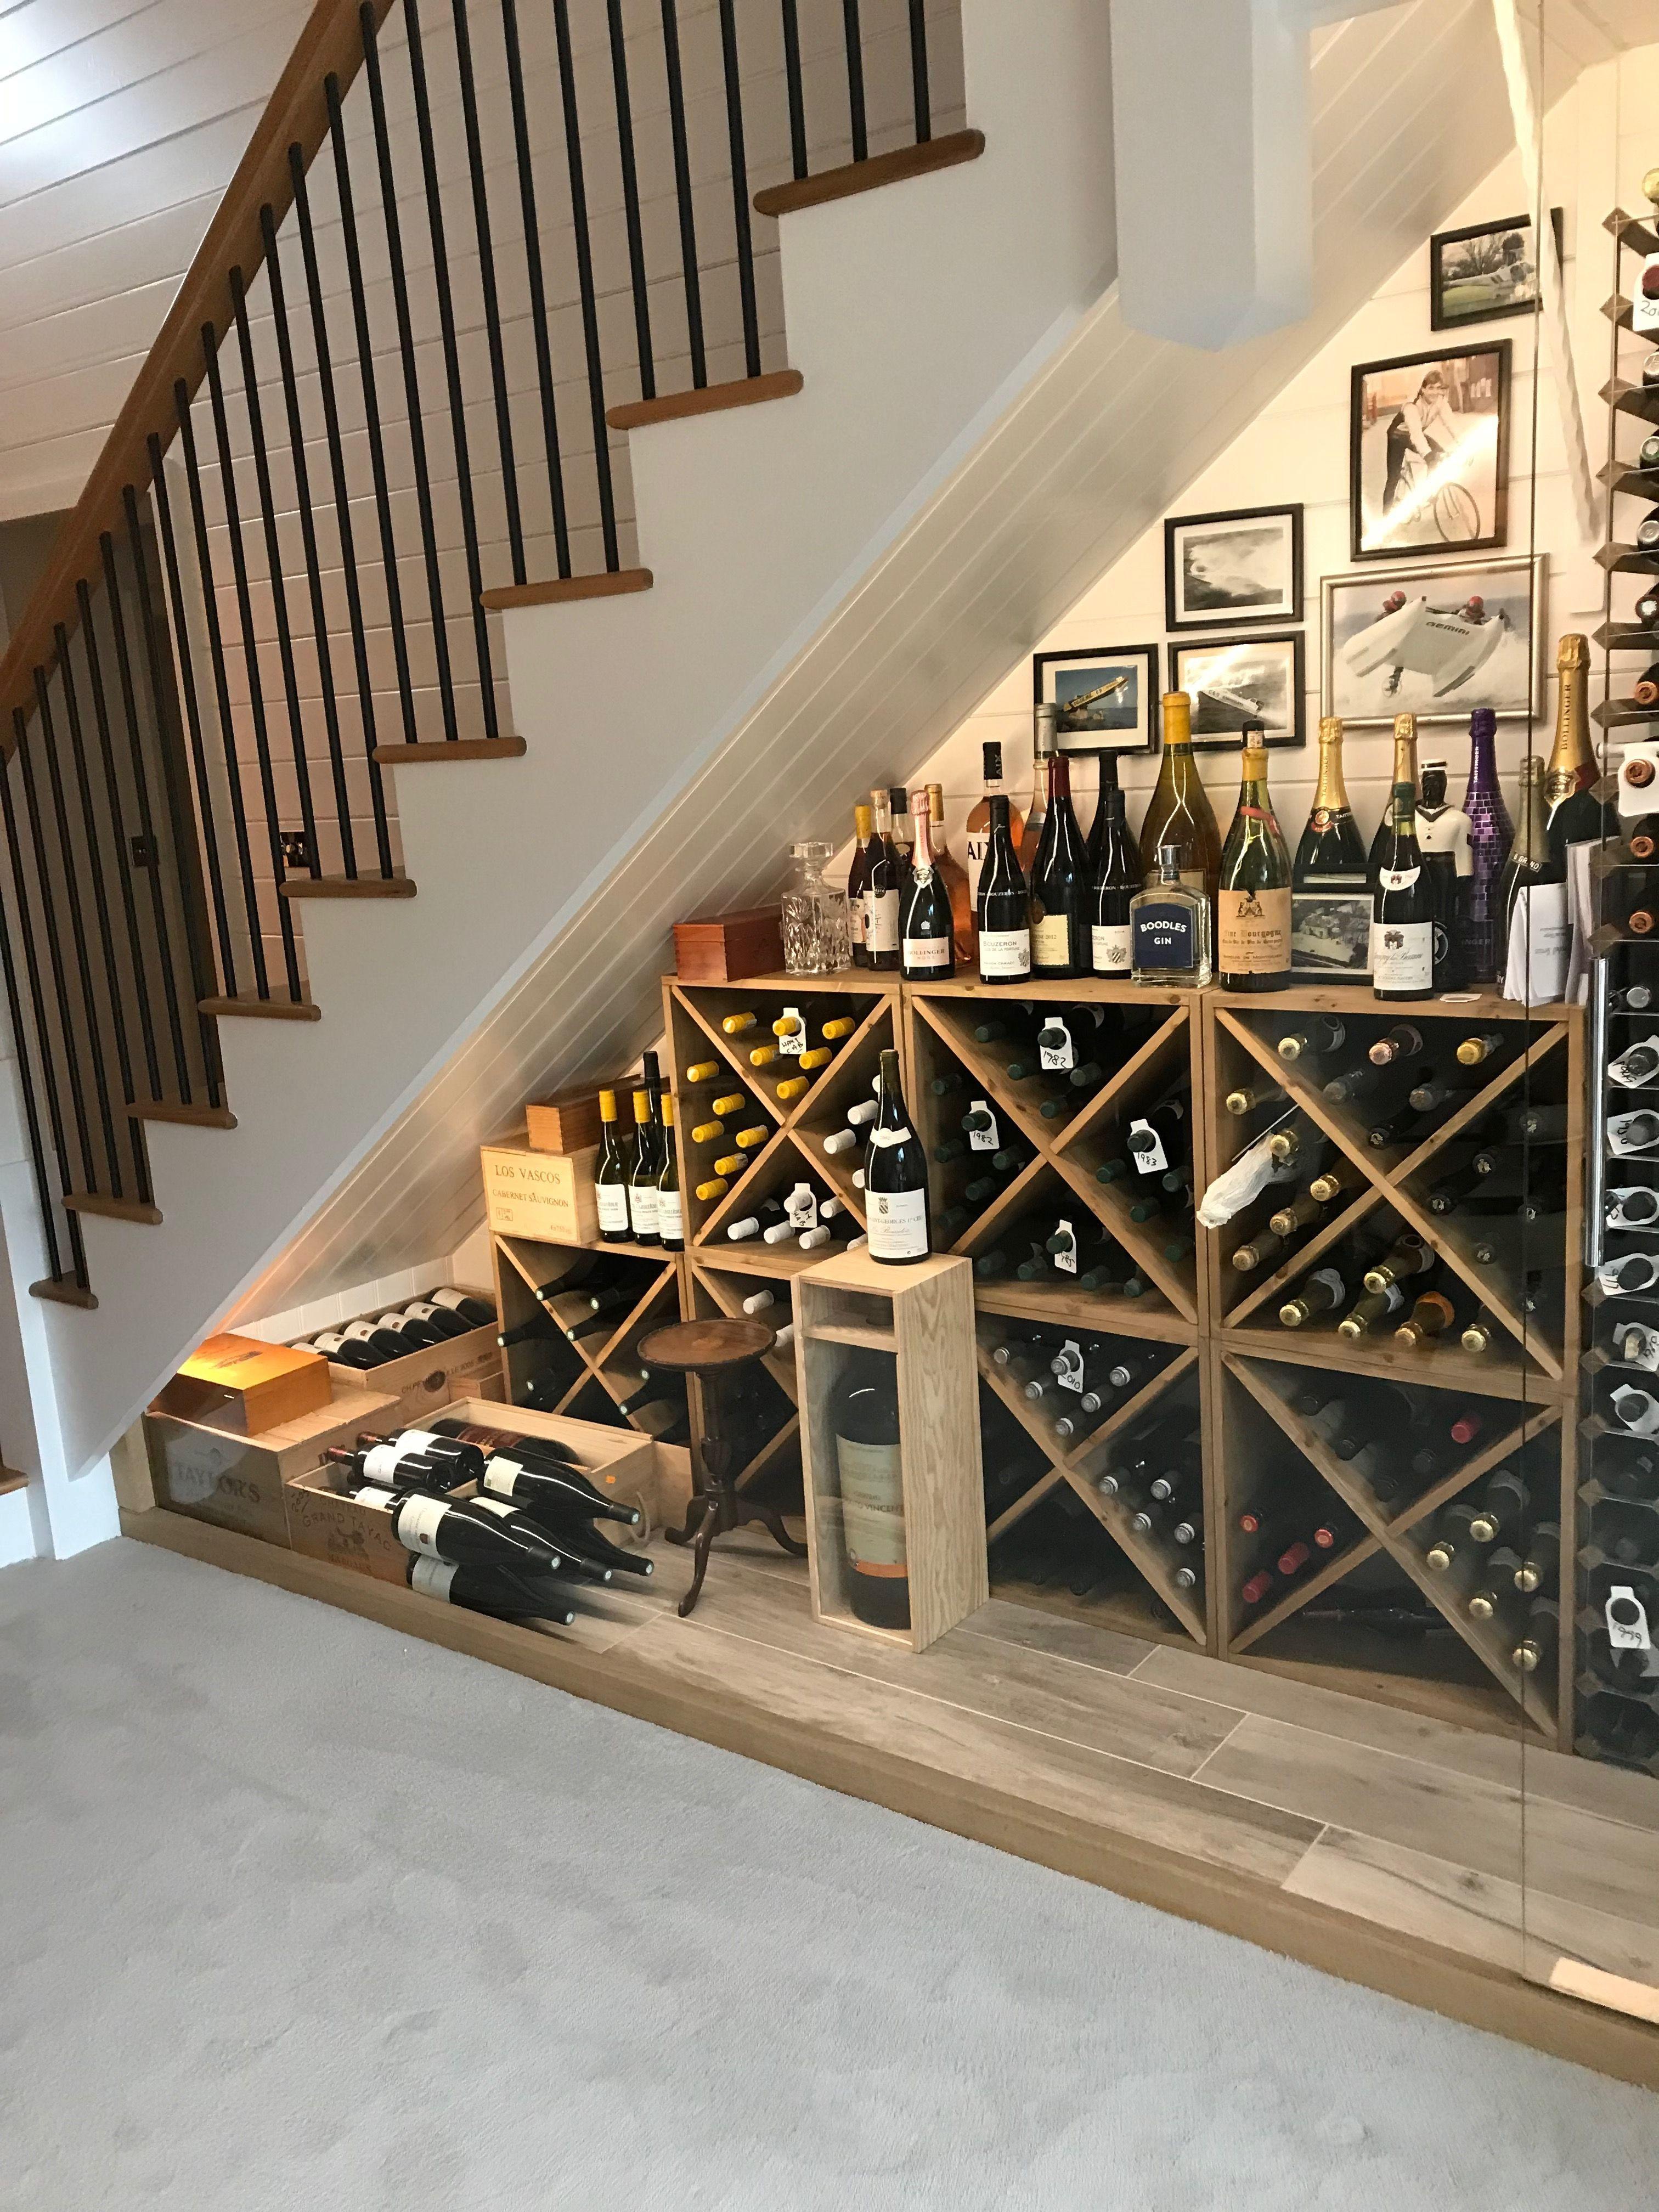 Chiby Under Stairs Wine Cellar Home